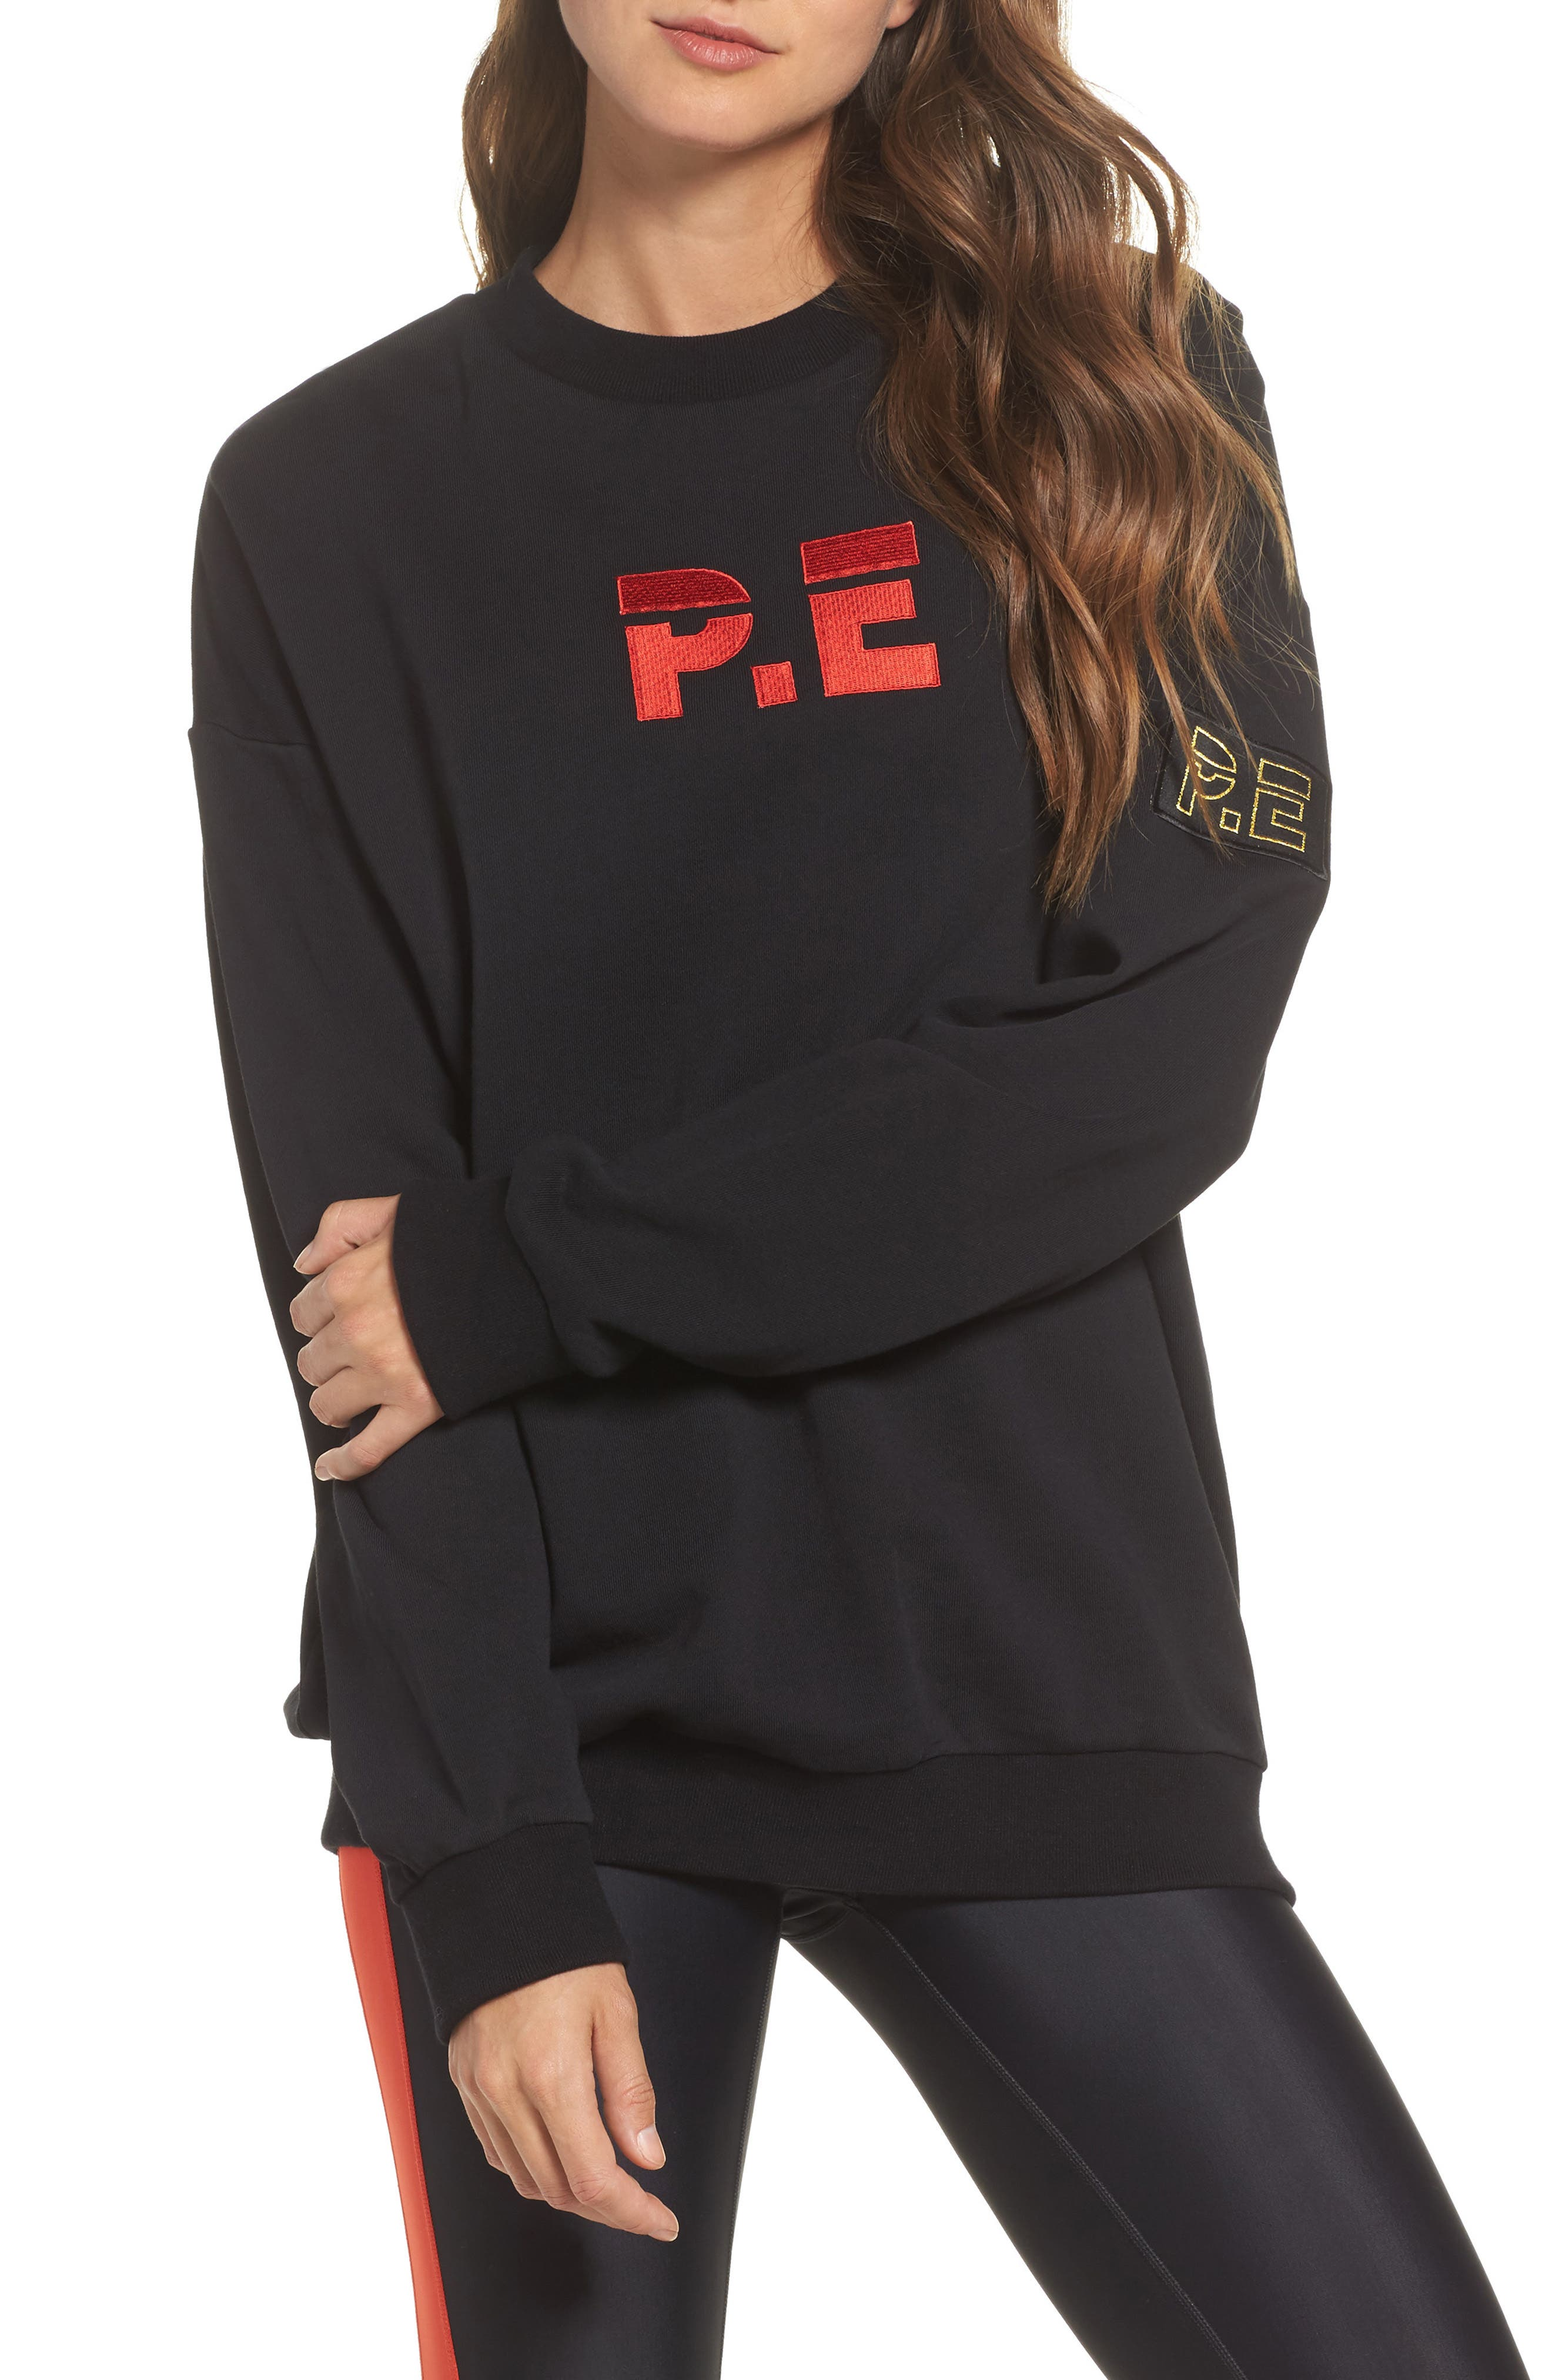 Get Set Sweatshirt,                             Main thumbnail 1, color,                             Black